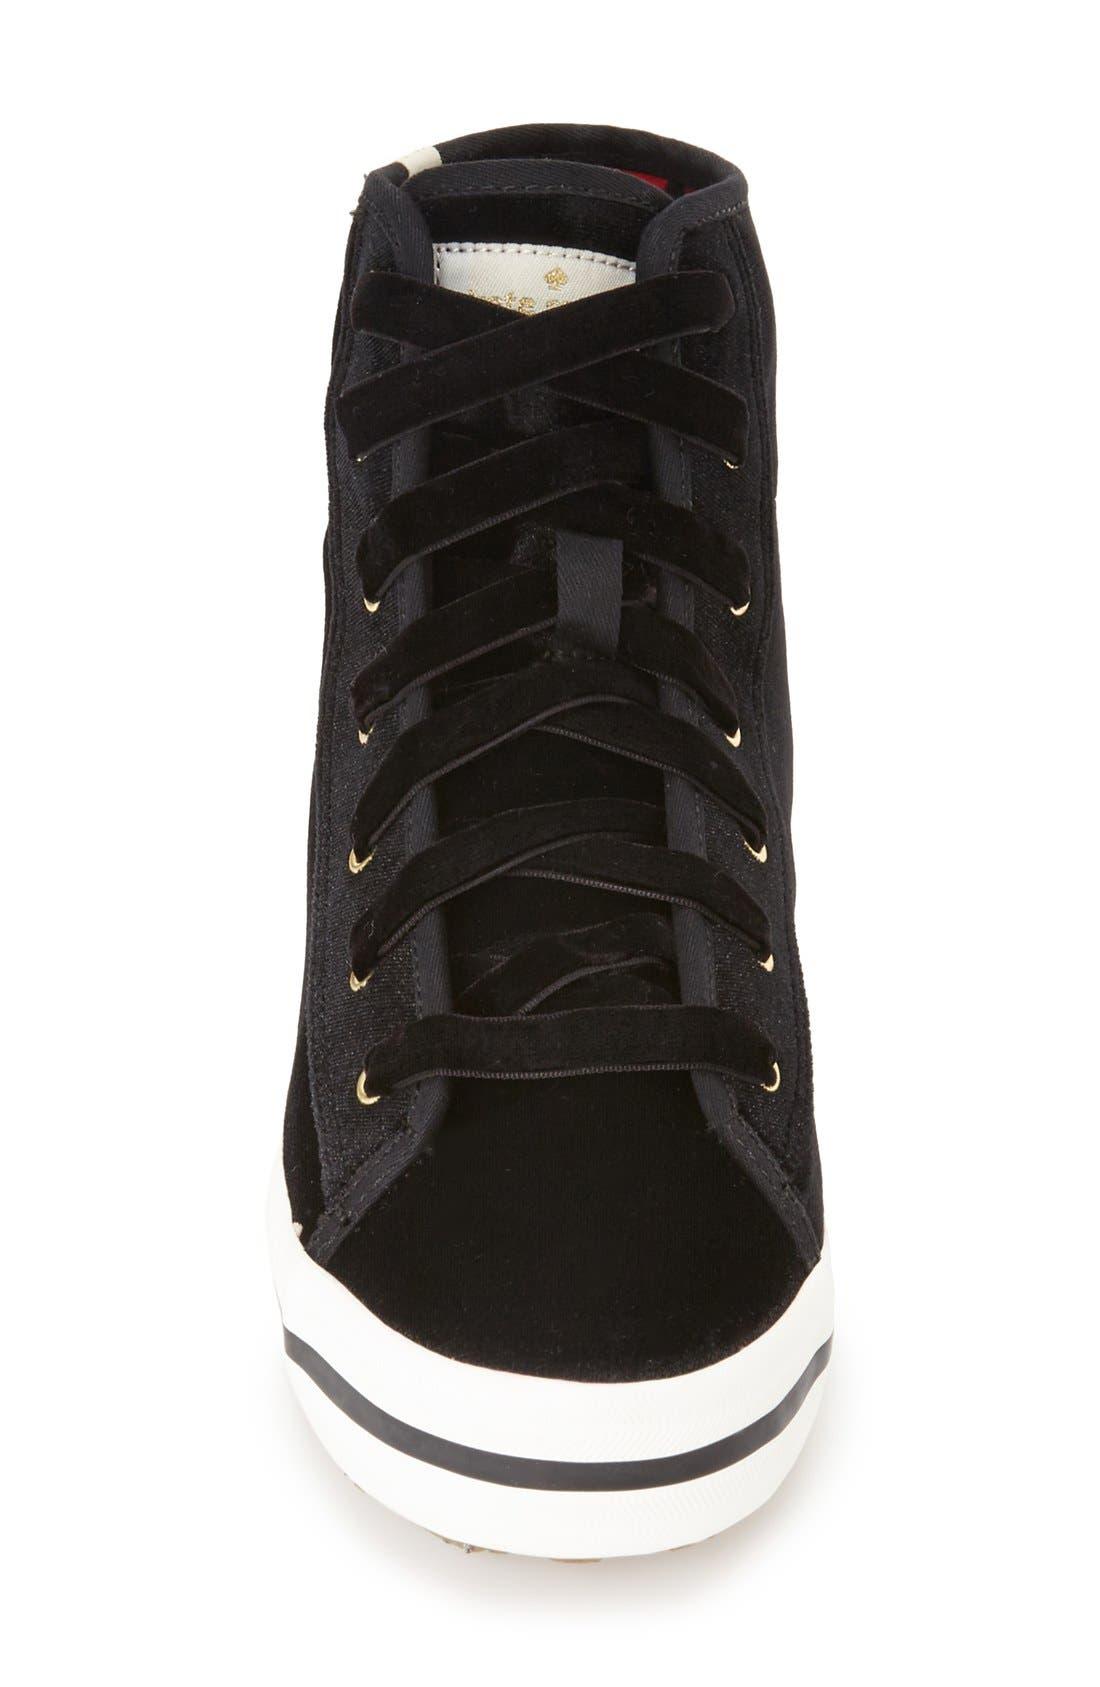 Alternate Image 3  - Keds® for kate spade new york 'dori' high top sneaker (Women)